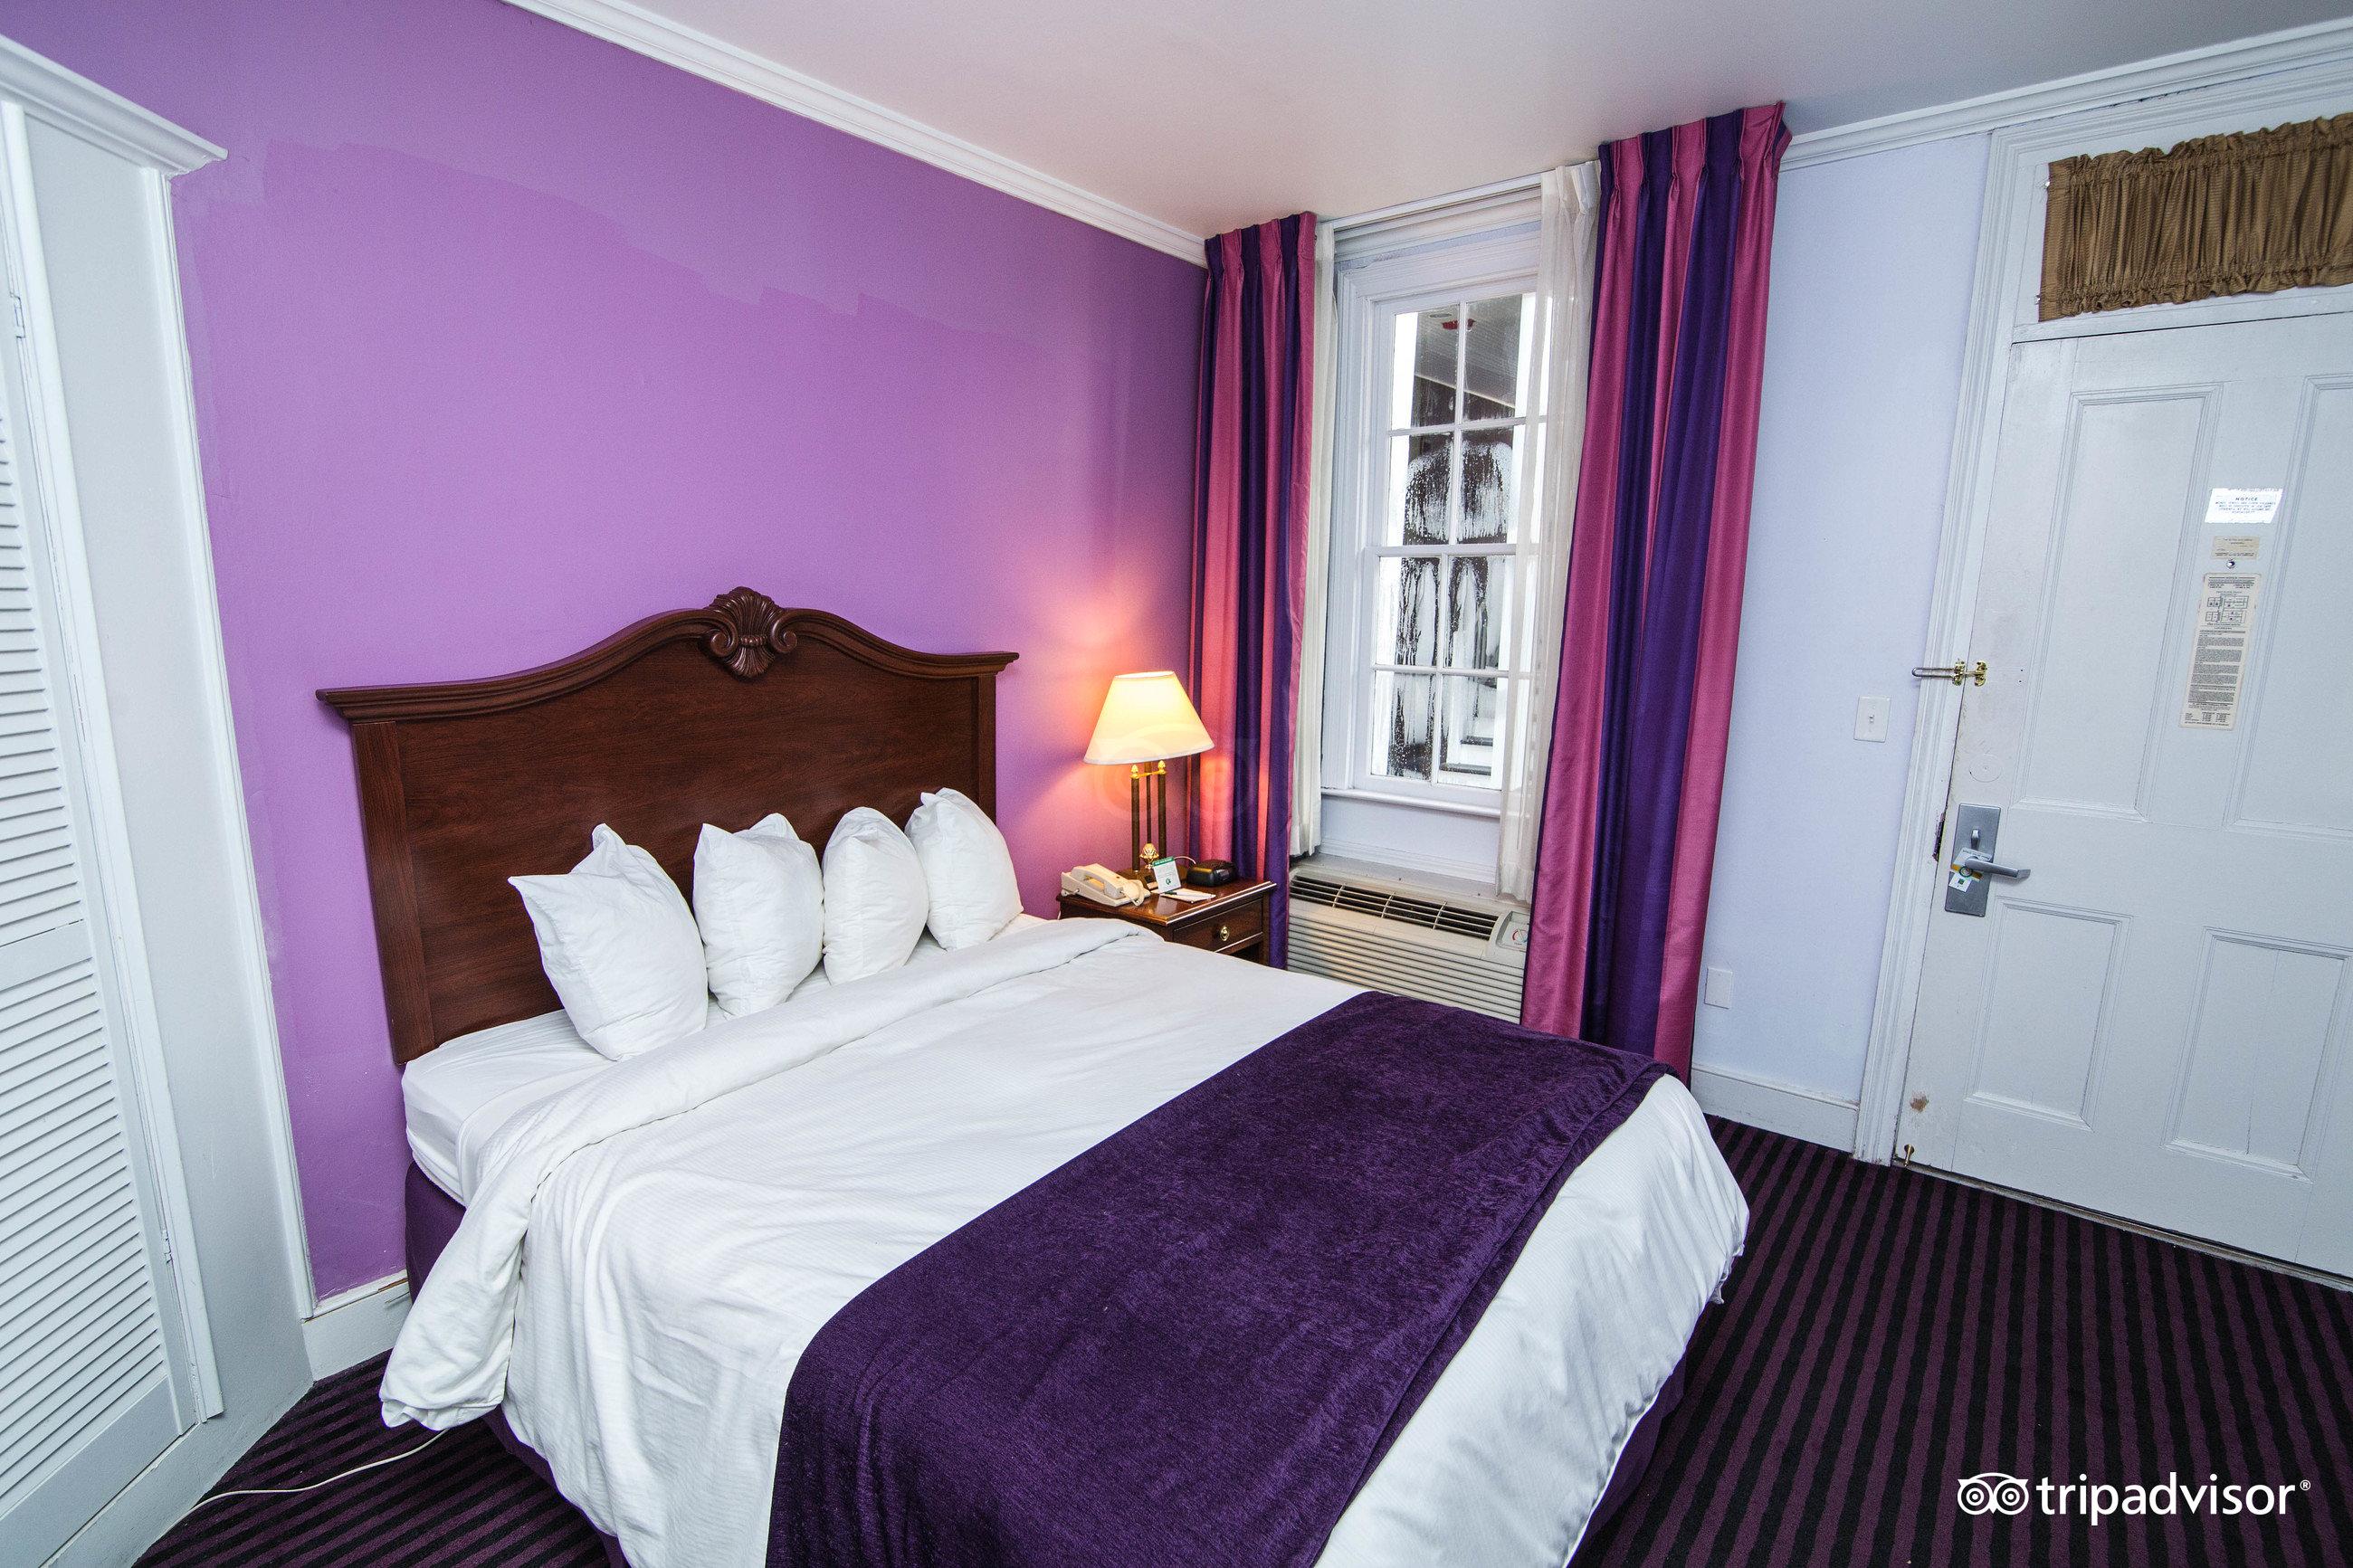 Quality inn suites maison st charles new orleans la for Amanda family maison